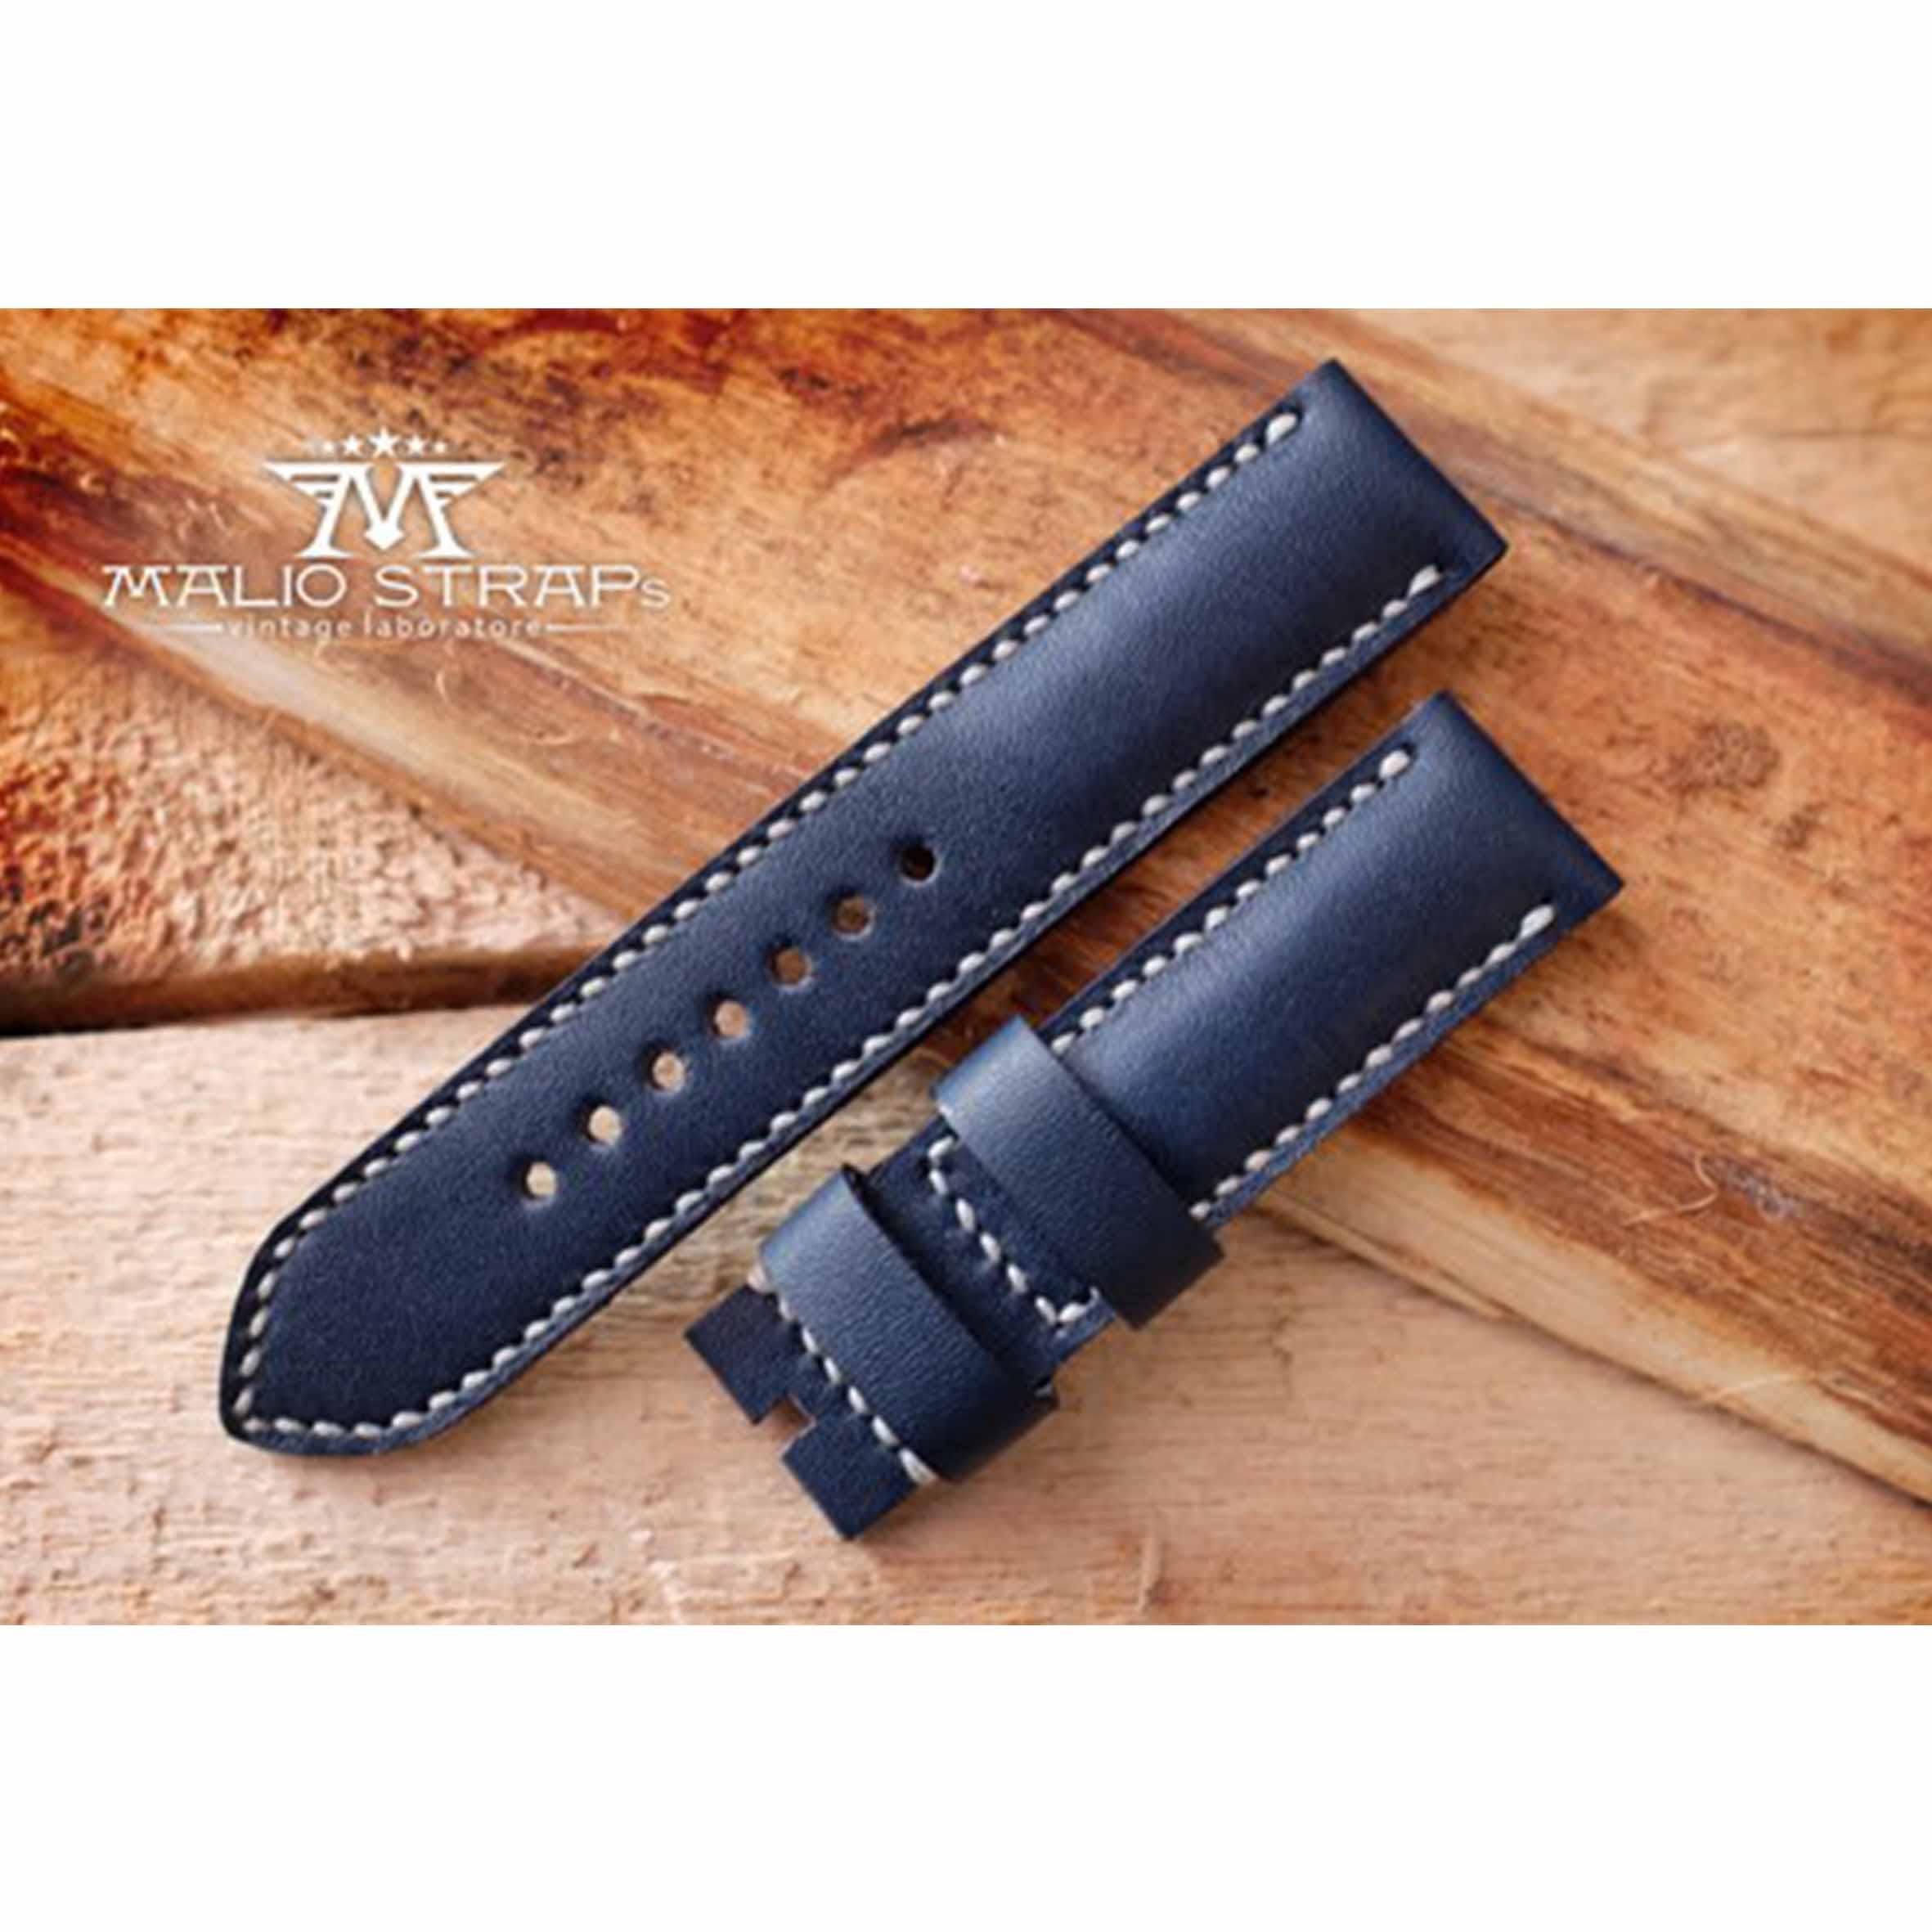 malio-straps-blu-serie-strapsonly (1)